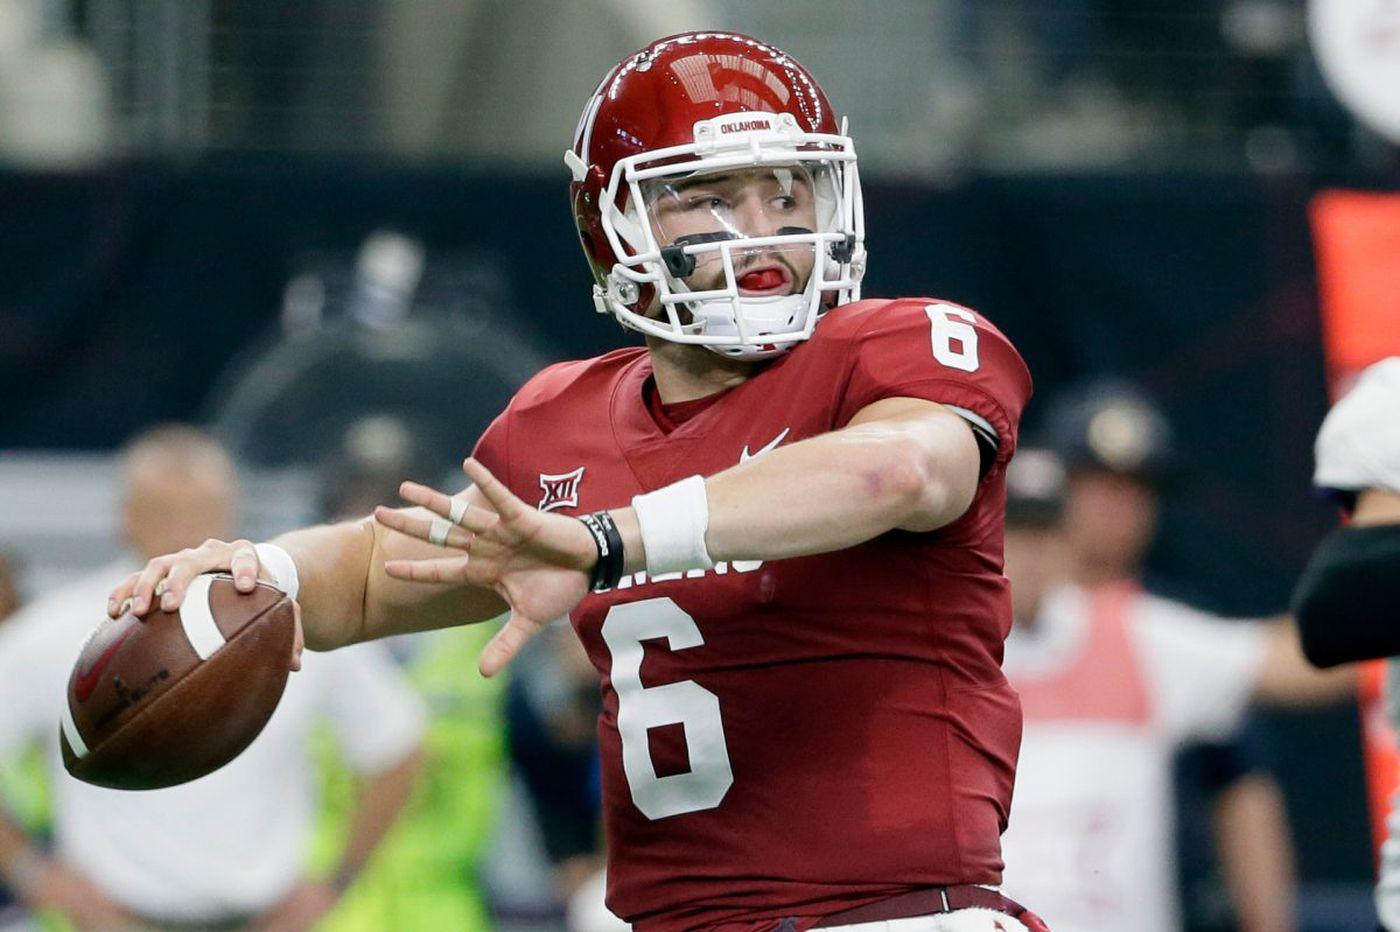 Les Bowen's 2018 NFL mock draft